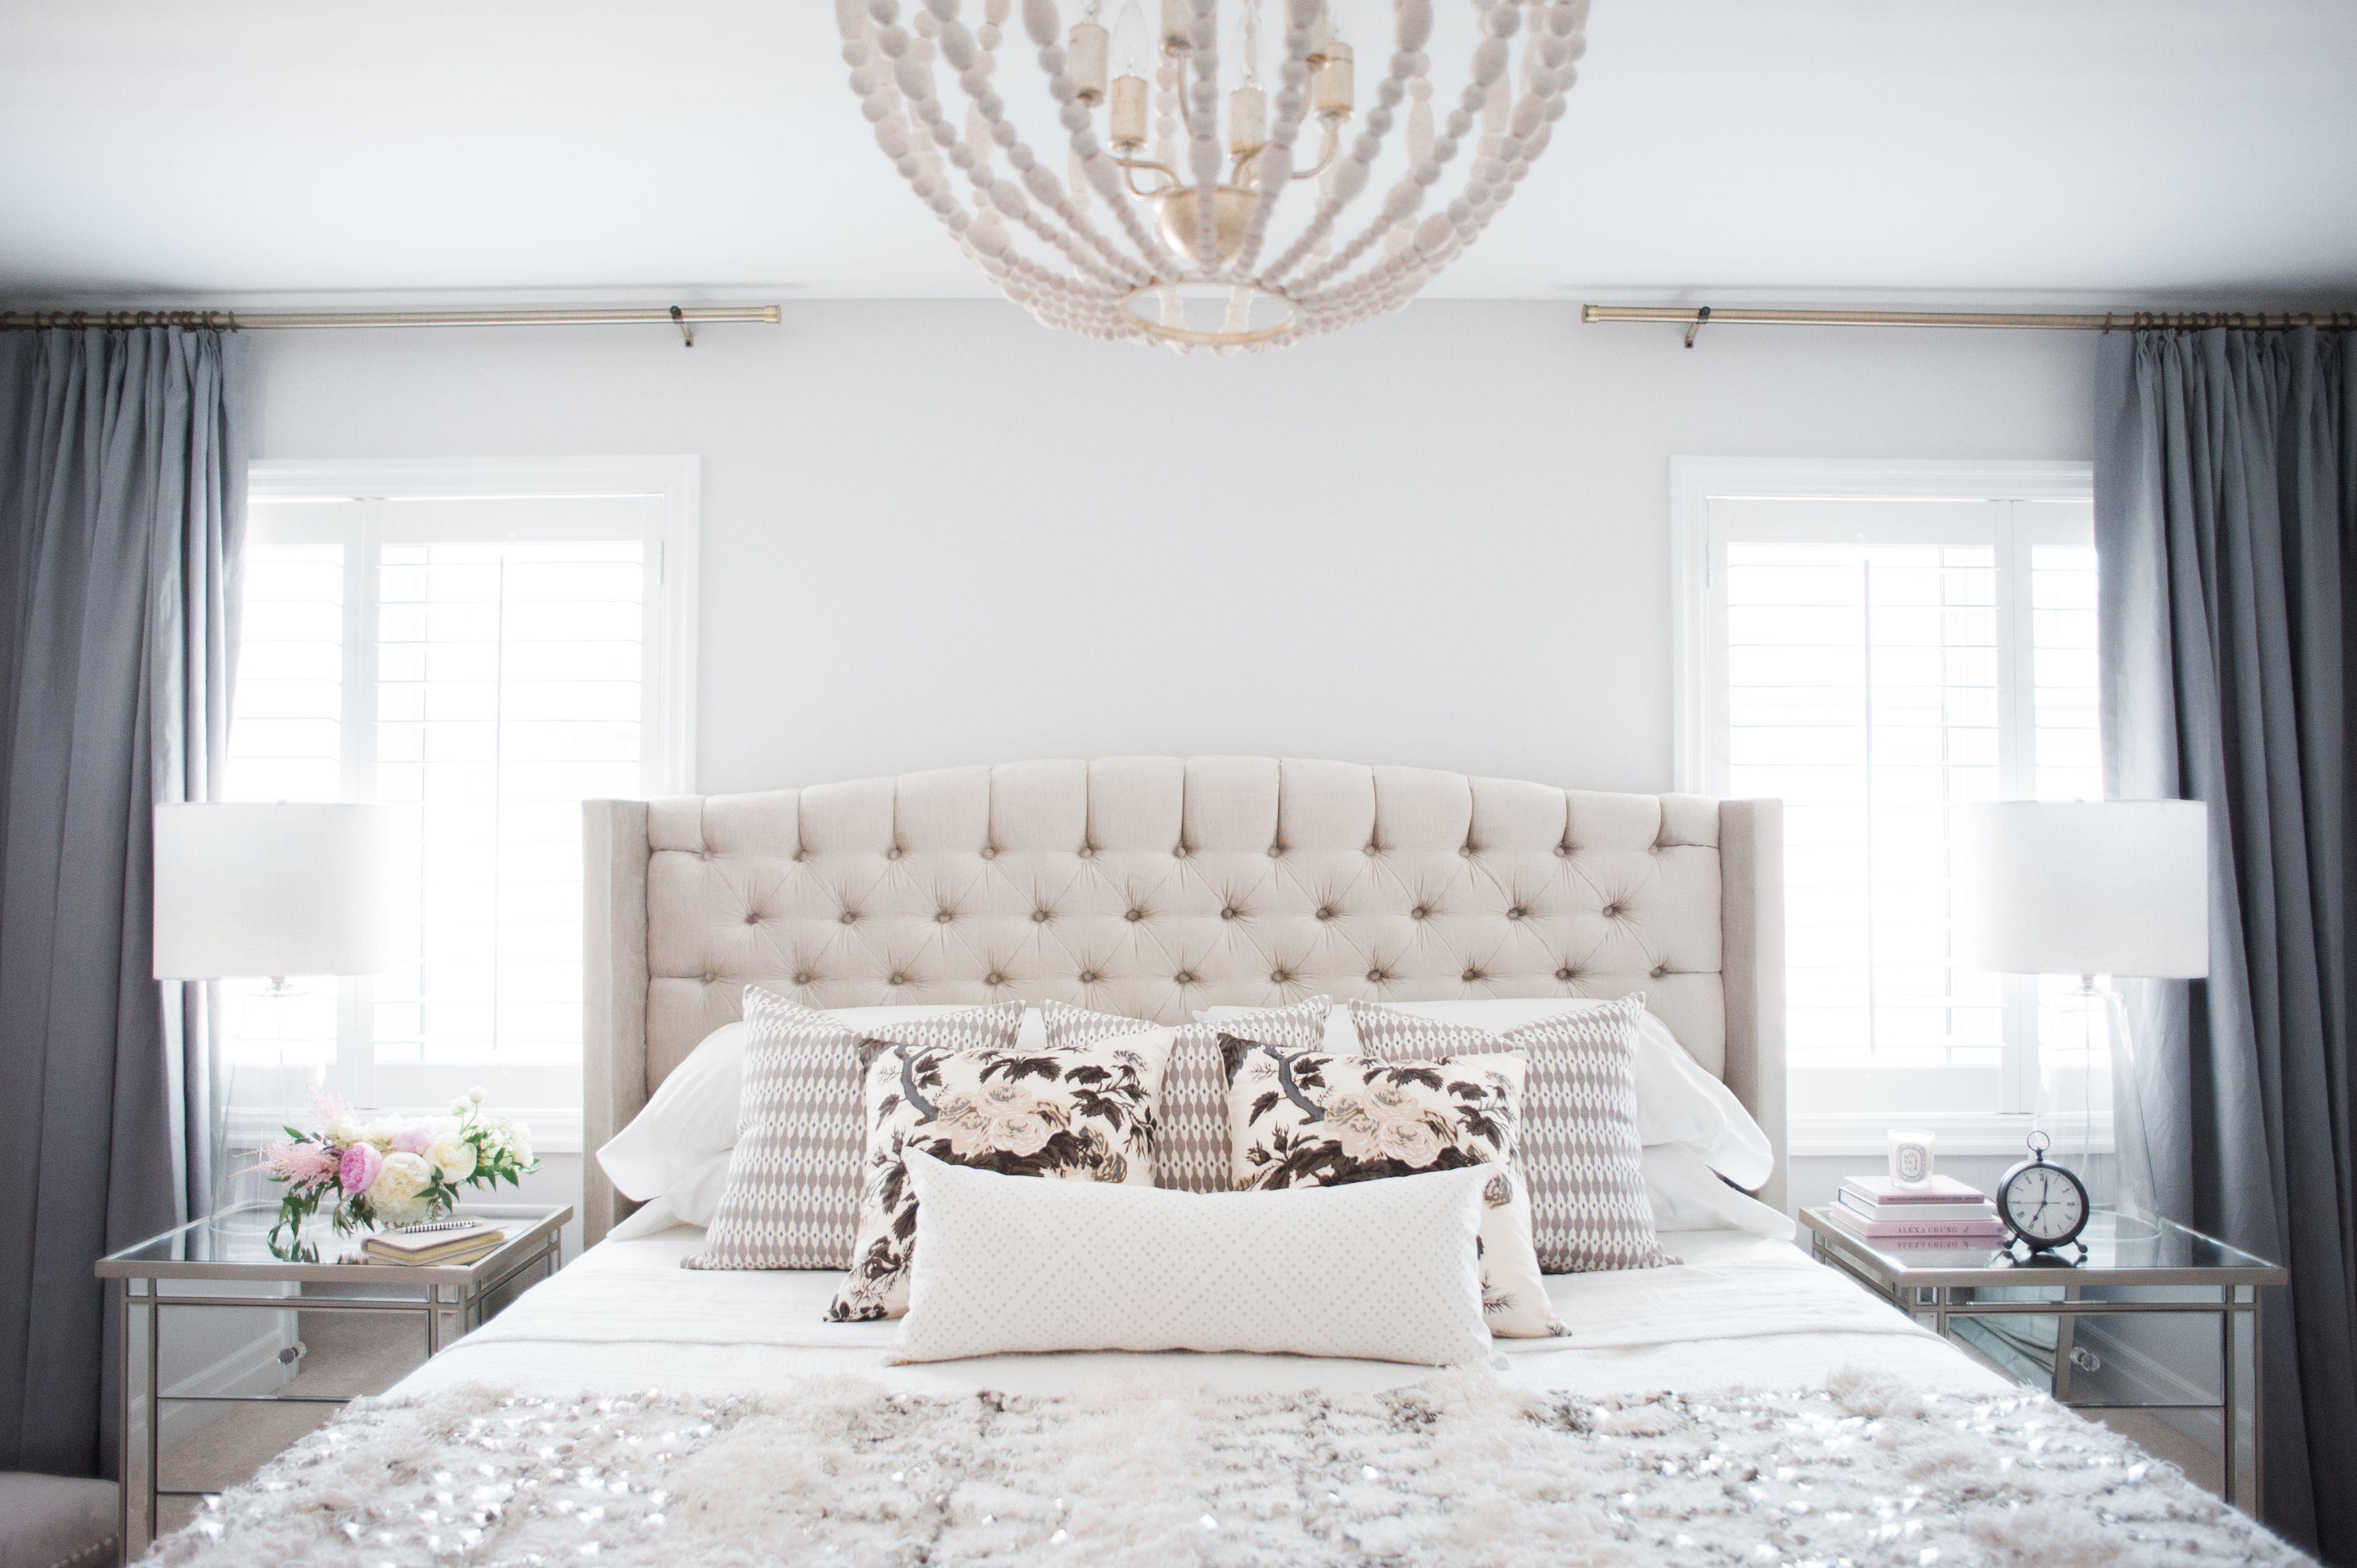 Beautiful Bedrooms 13 1 - 35 Stylish Bedroom Decorating Ideas